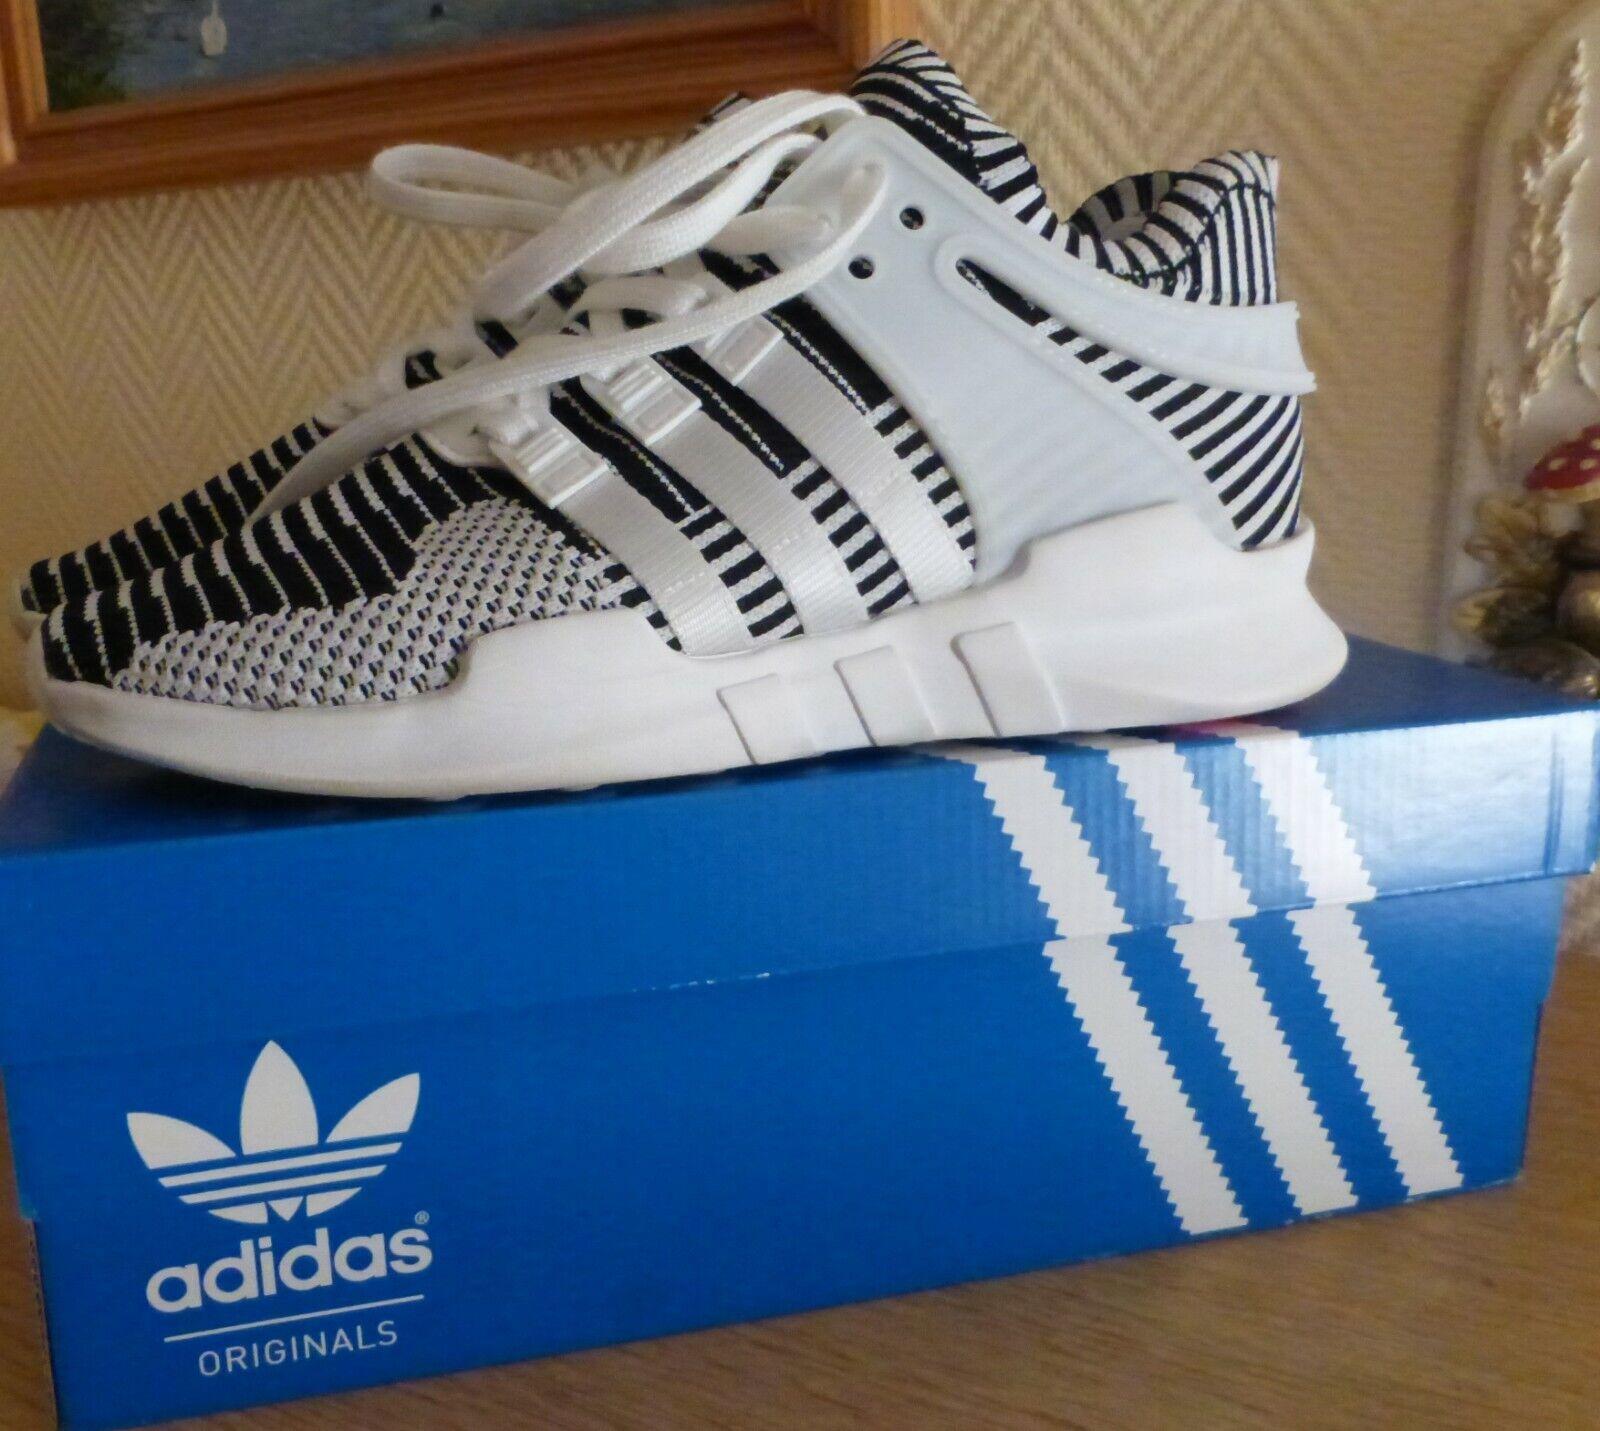 Adidas U EQT SUPPORT ADV PK Weiß Turbo Schuhe Turnschuhe Gr 40 UK 6,5 weiß schwarz